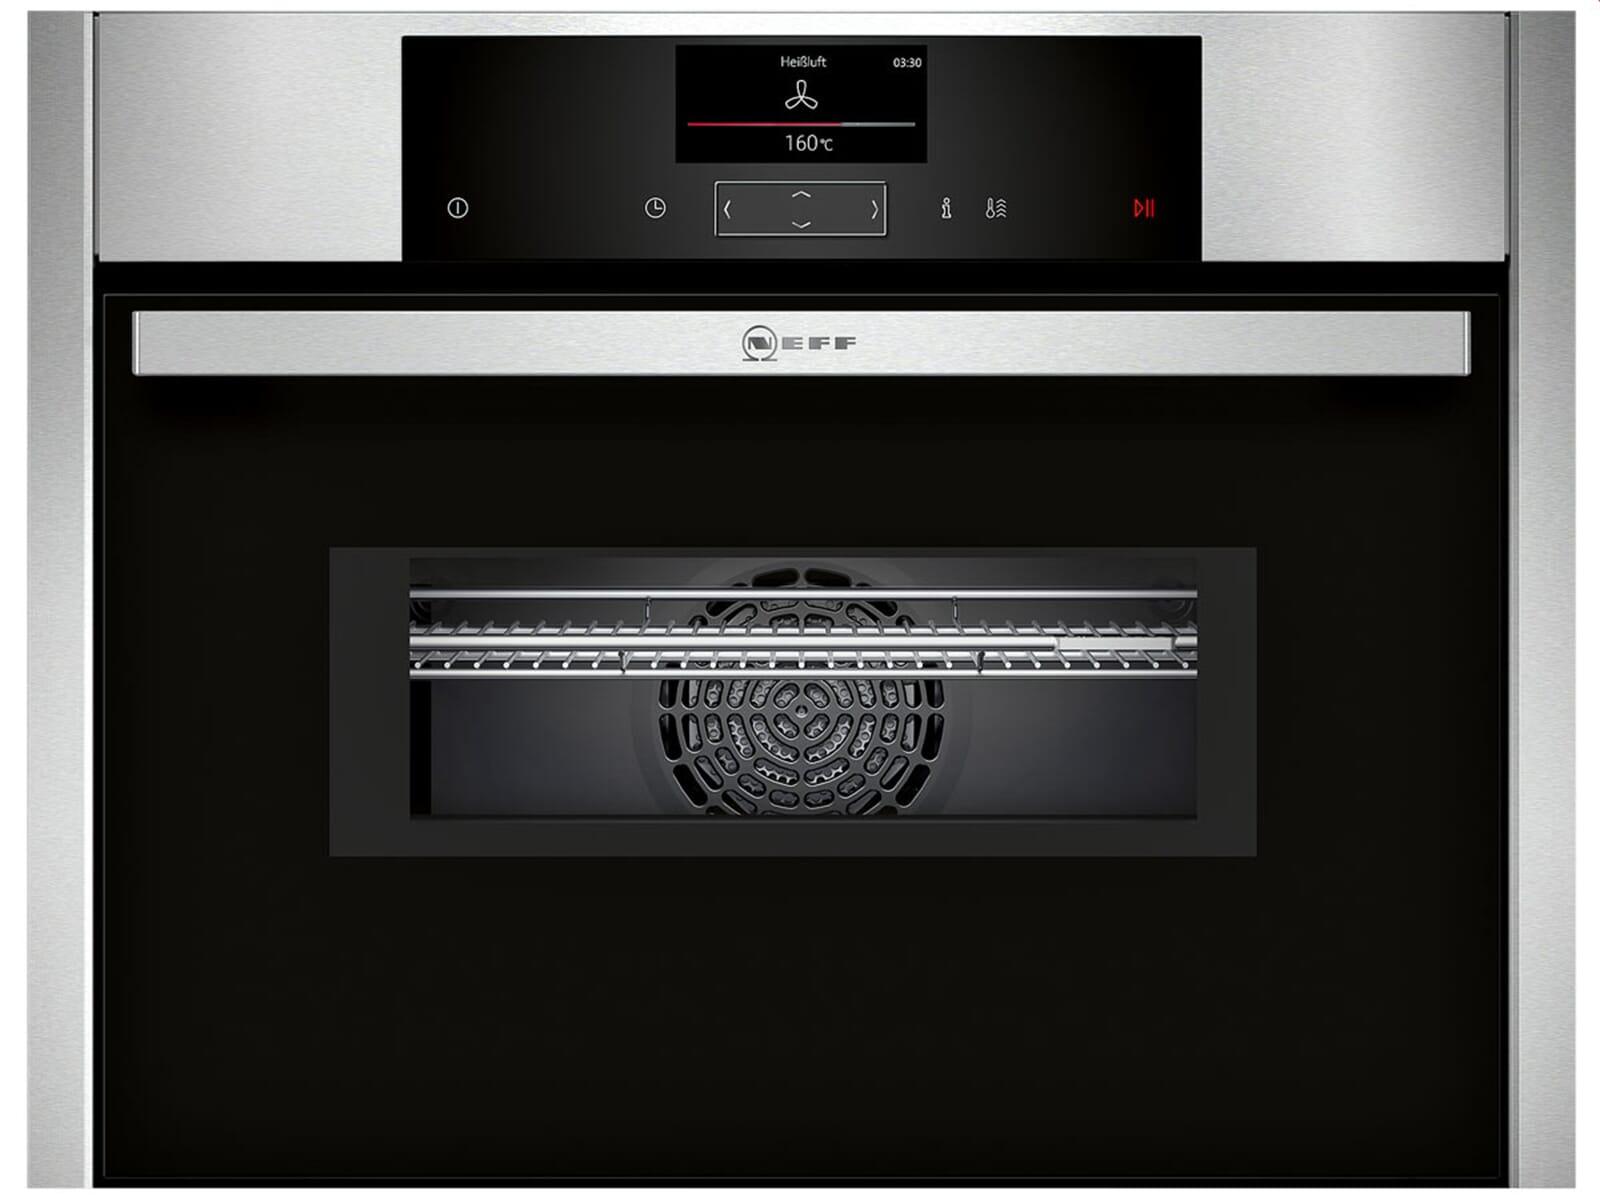 neff cms 1522 n kompakt backofen mikrowelle einbau. Black Bedroom Furniture Sets. Home Design Ideas